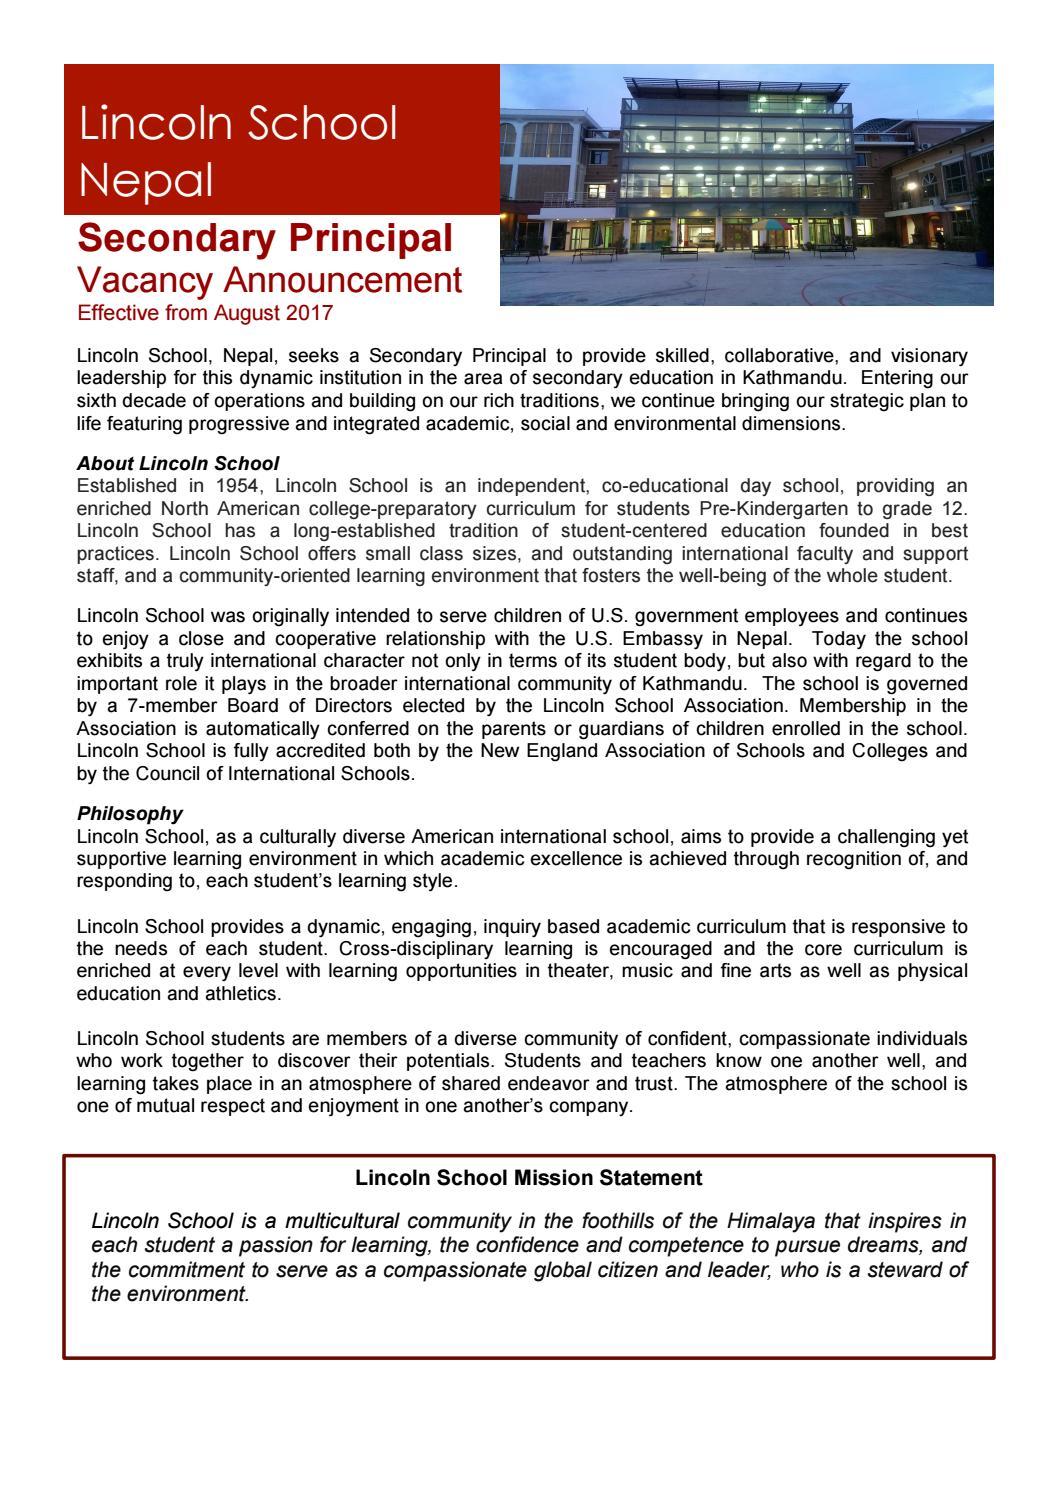 Lincoln School Nepal Secondary Principal by International